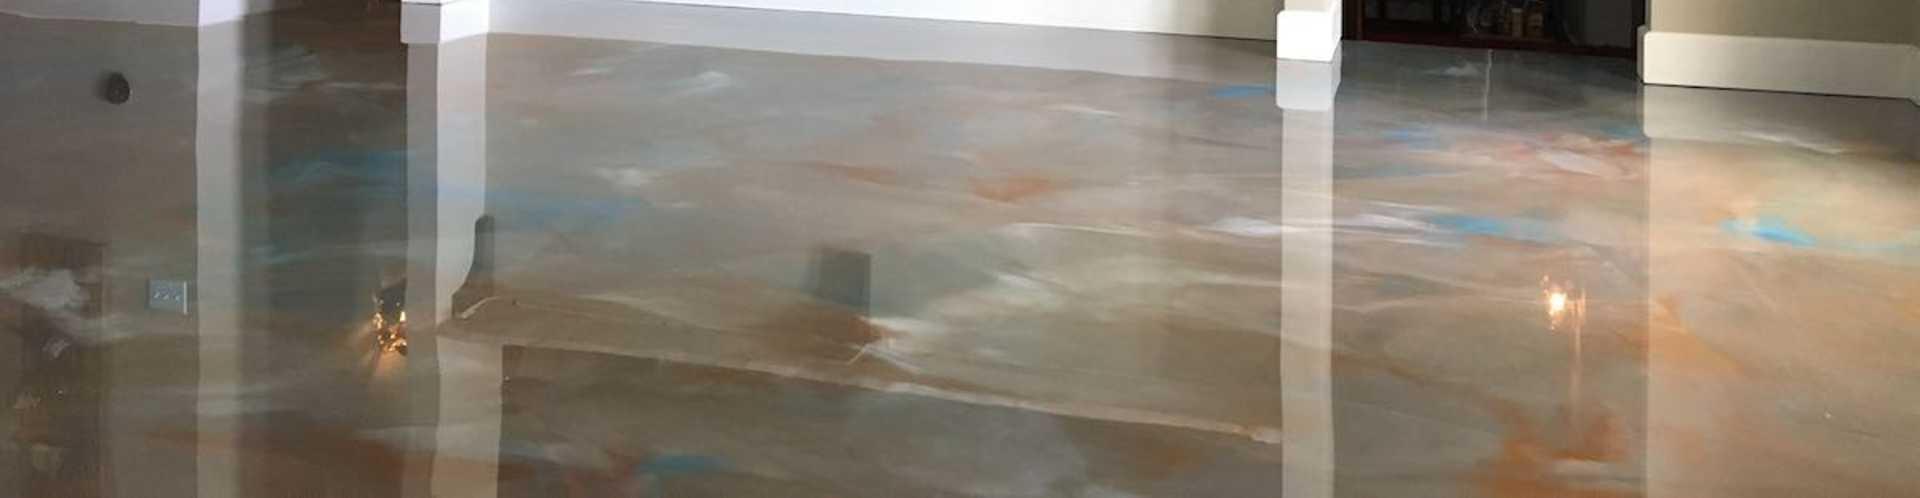 Finished Basement Floor   Installing Basement Flooring